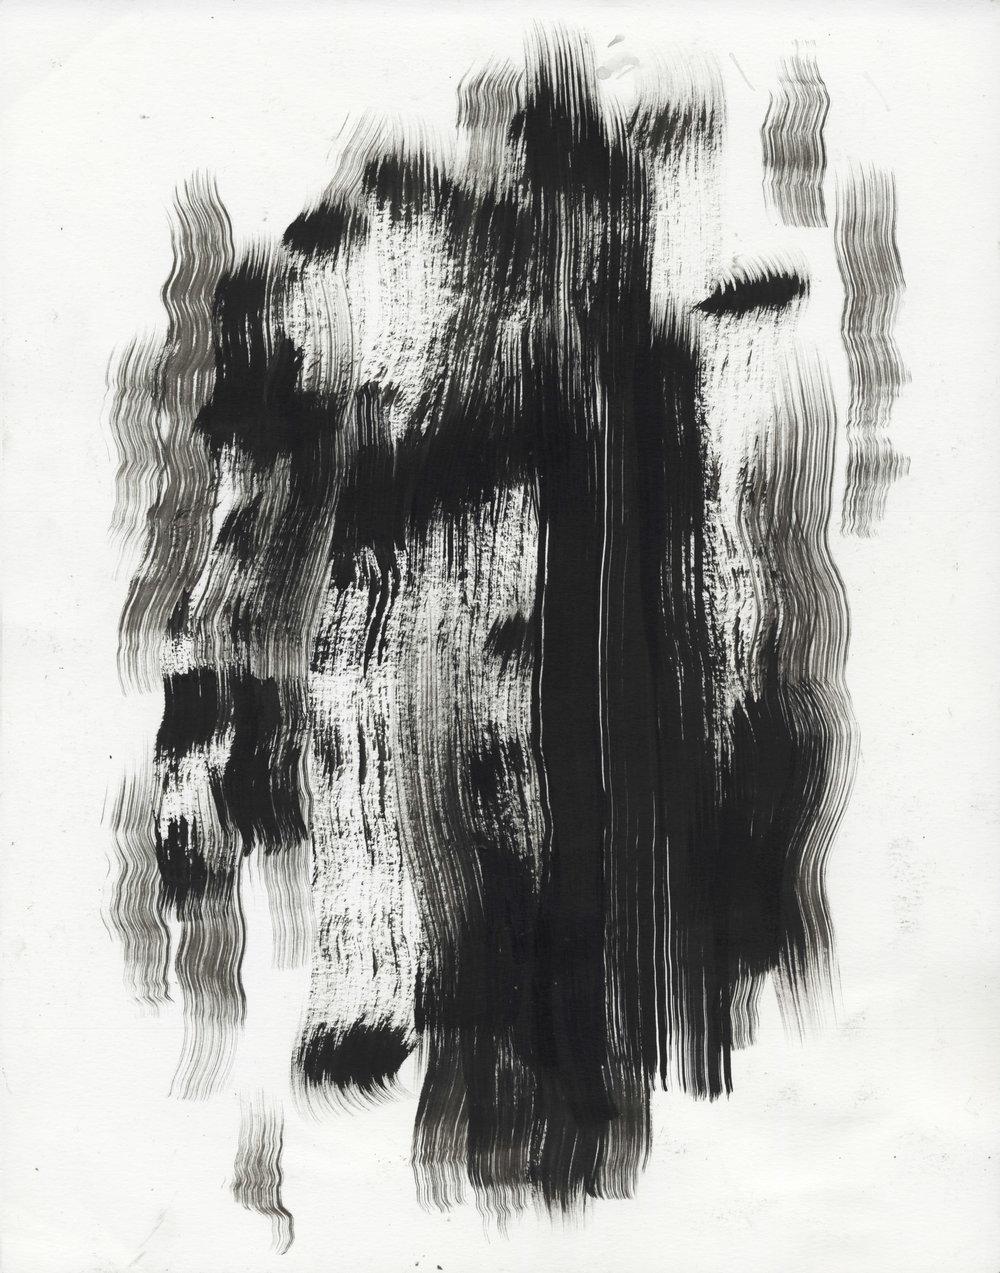 Rachel Wada - Sun Moon - Scan 4.jpg